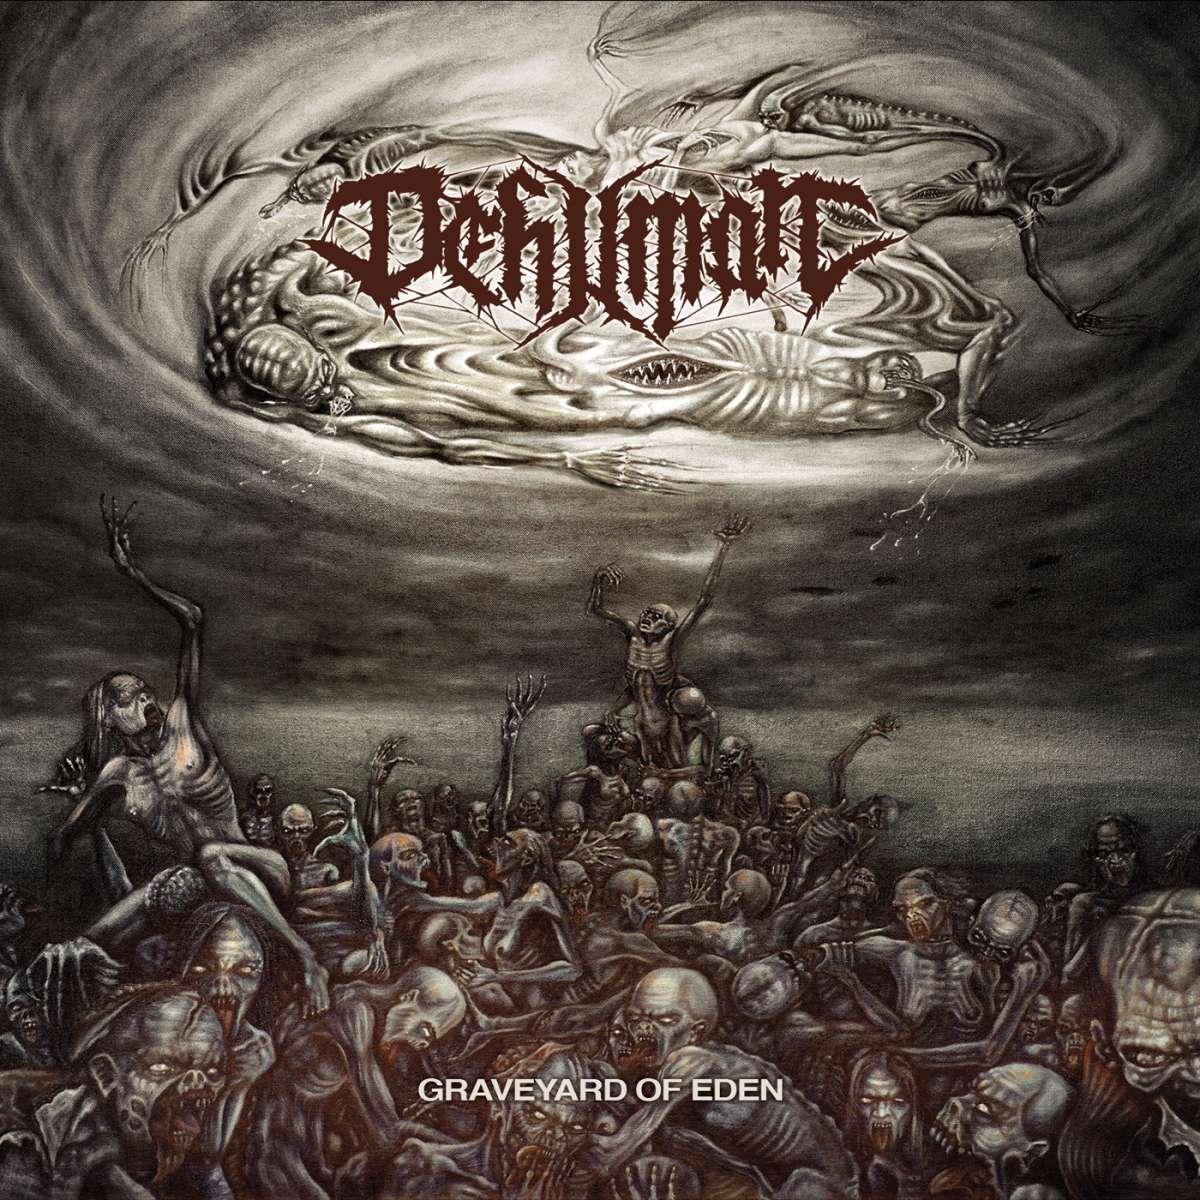 Dehuman-Graveyard-of-Eden-01